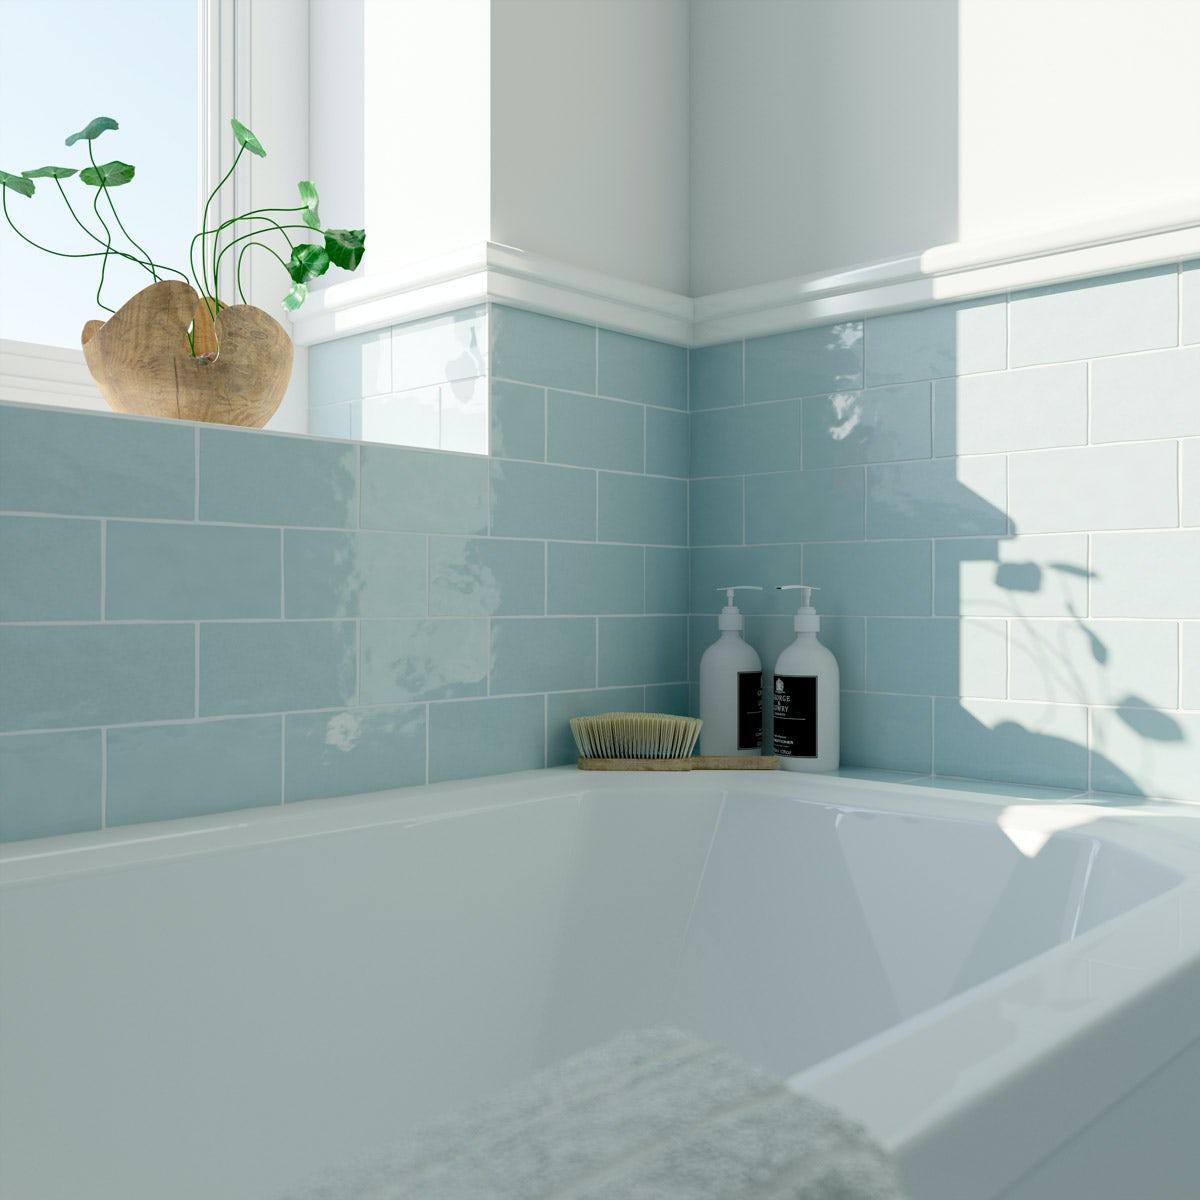 Laura Ashley Artisan duck egg blue gloss wall tile 75mm x 150mm